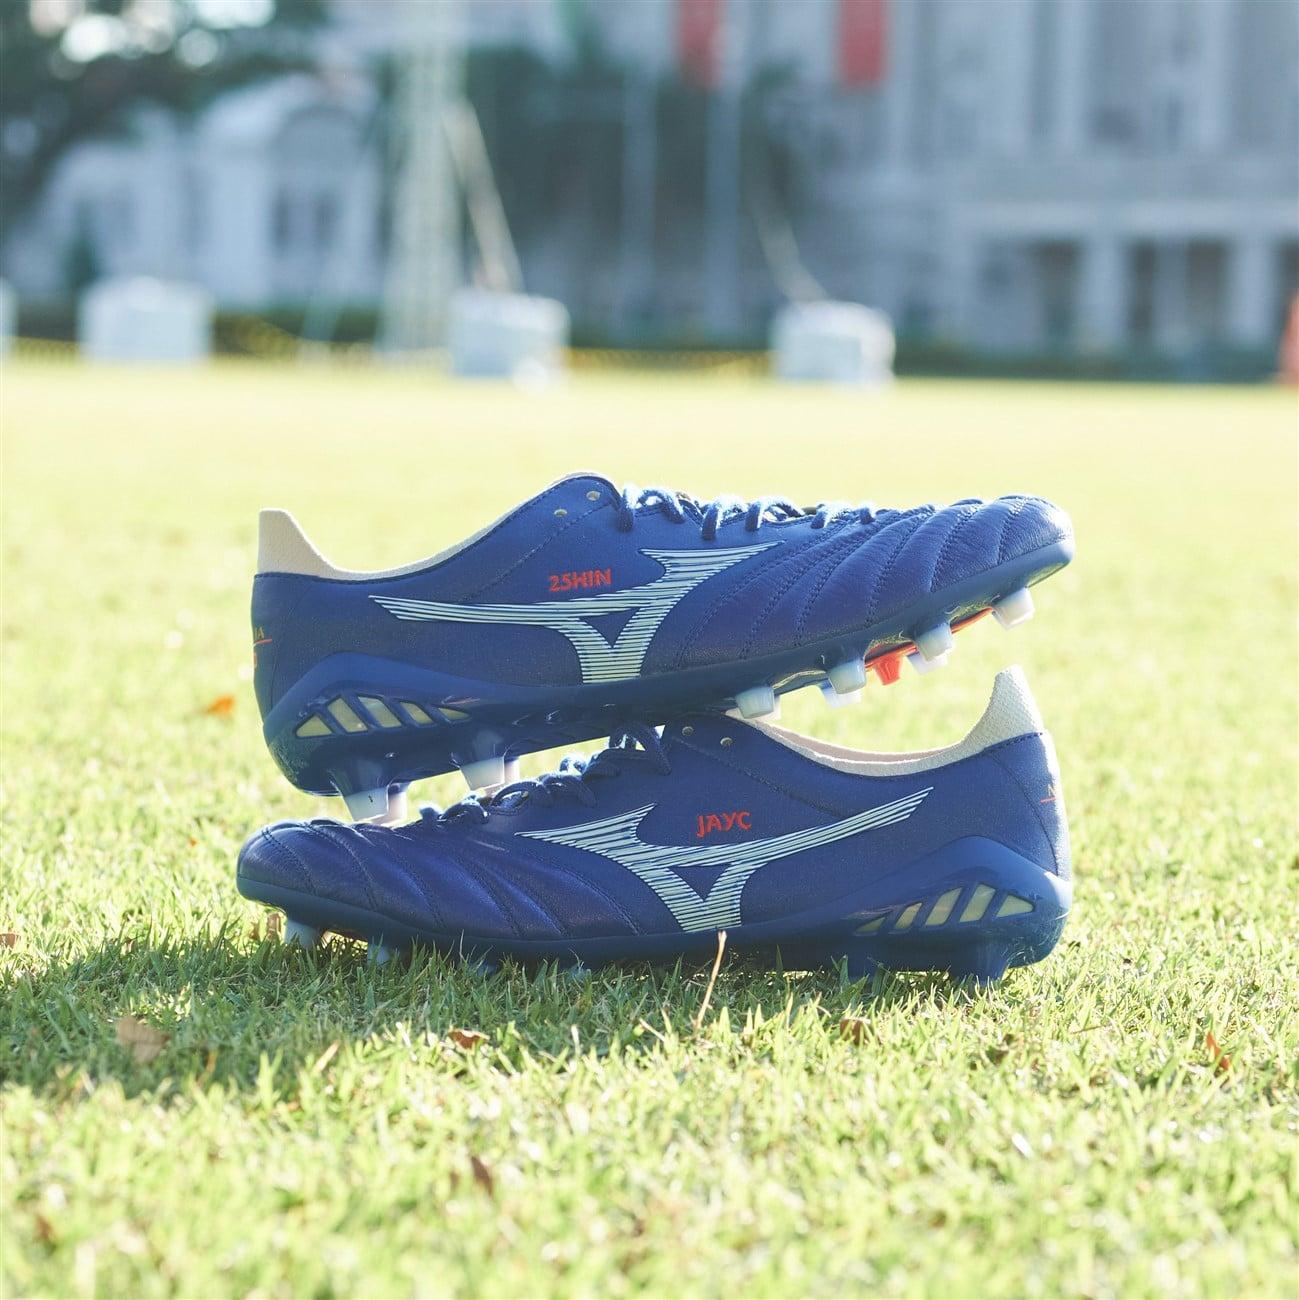 mizuno morelia neo 3 japan football boots soccer cleats review (1)